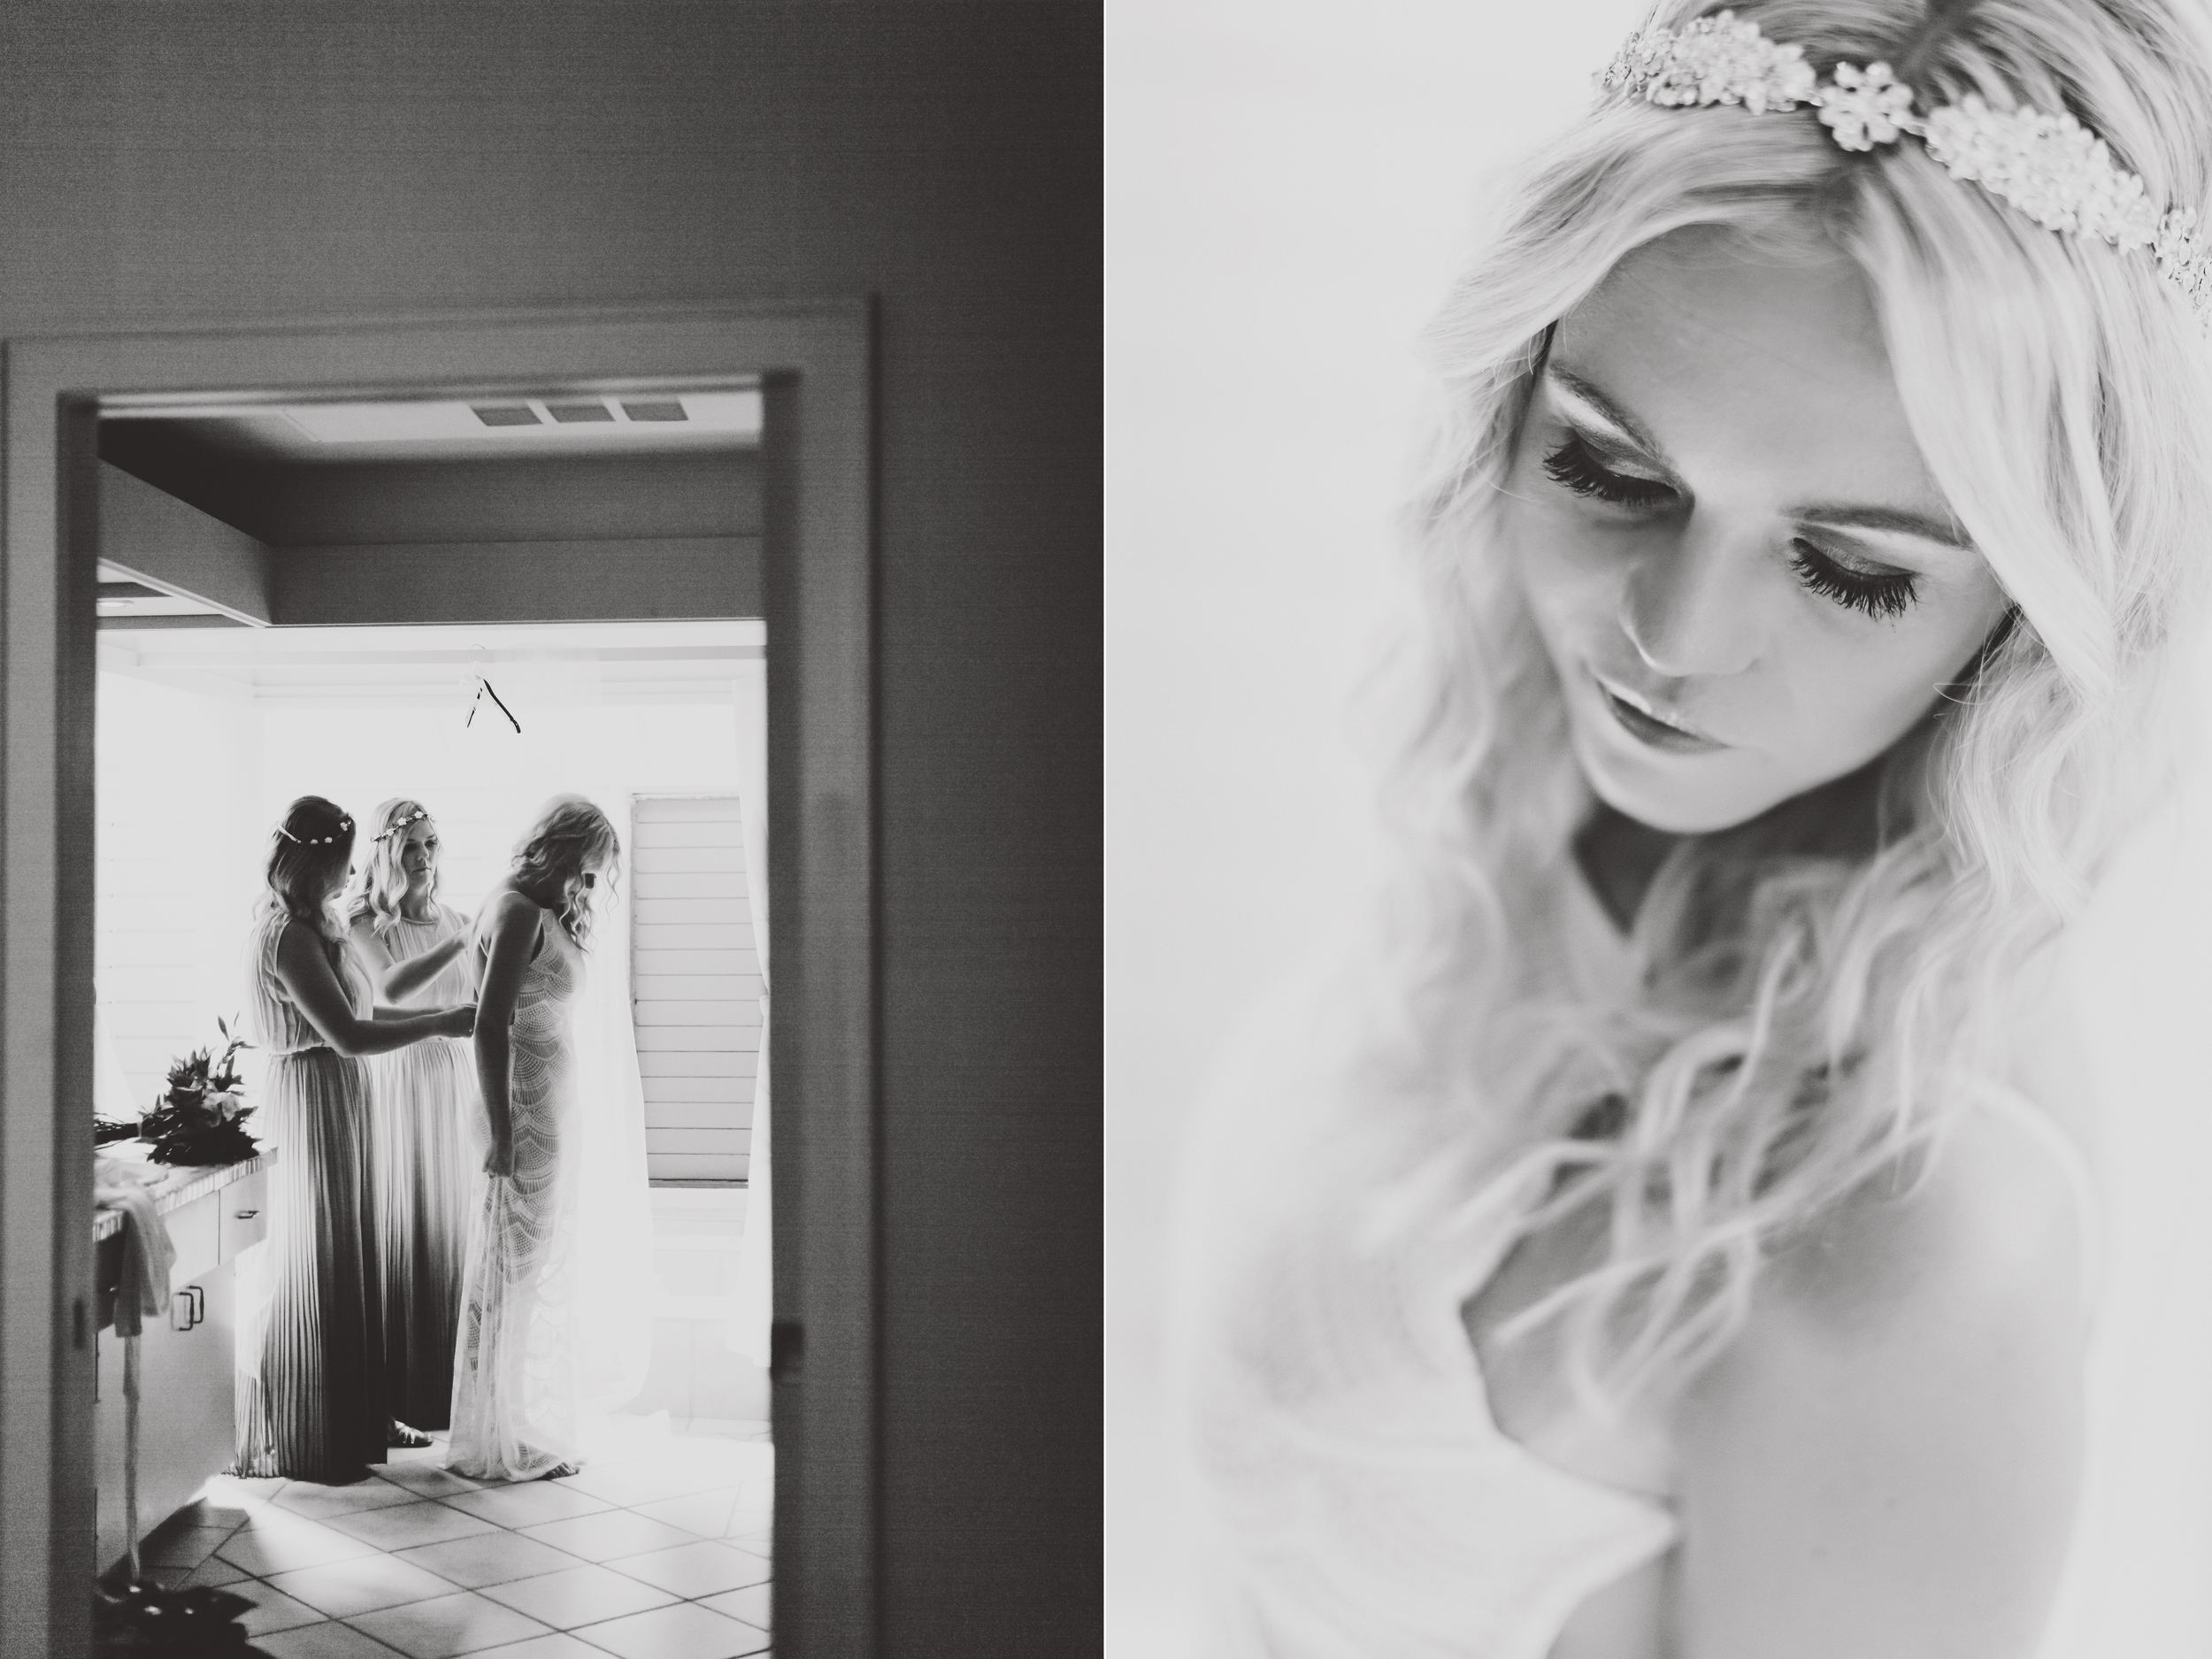 angie-diaz-photography-hawaii-wedding-8.jpg